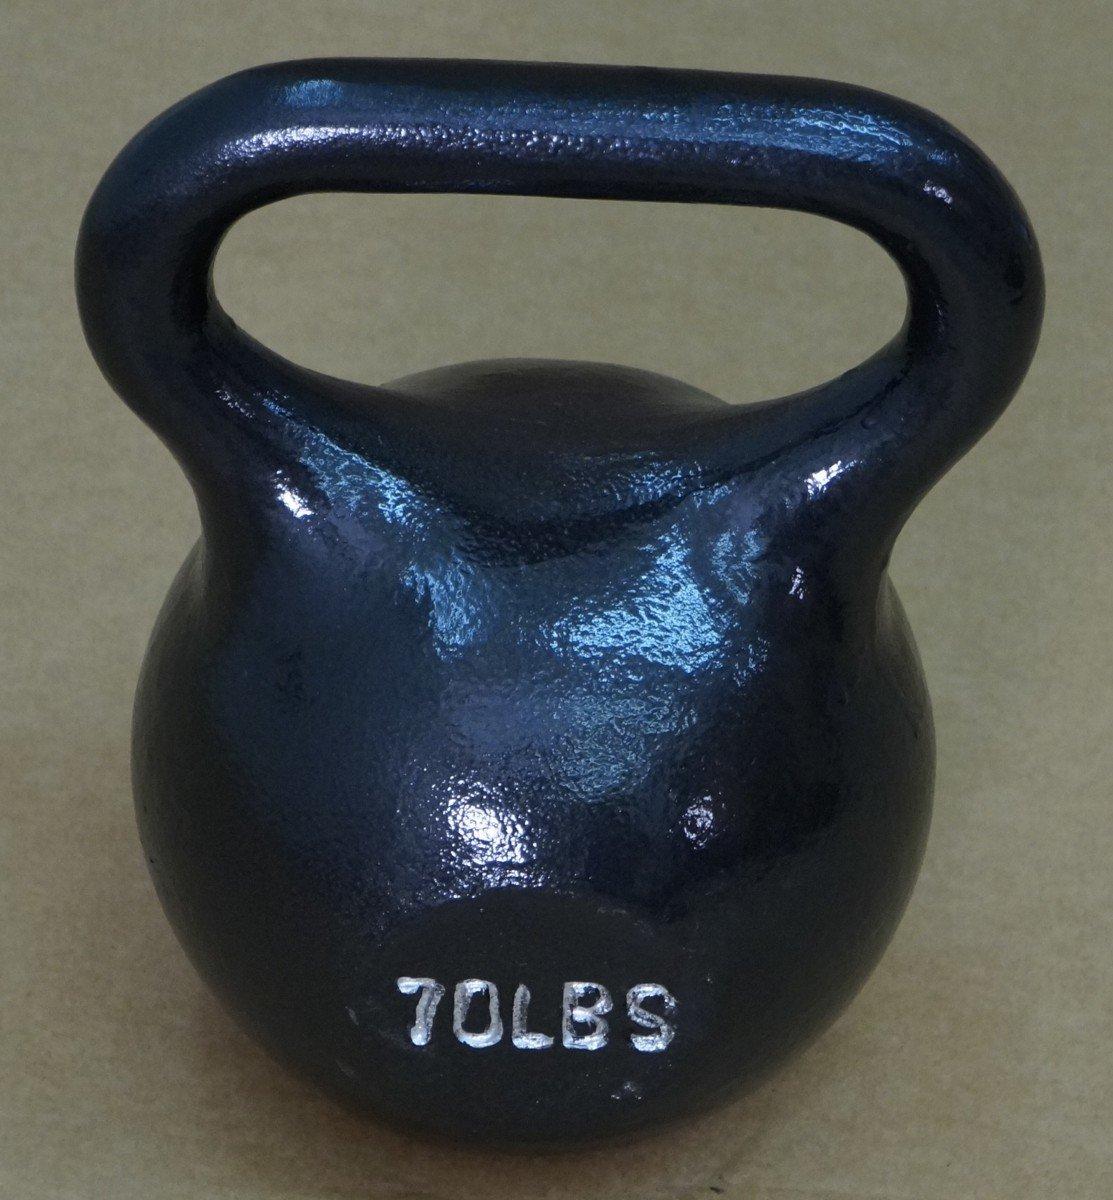 70 lb Wide Handle Kettlebell